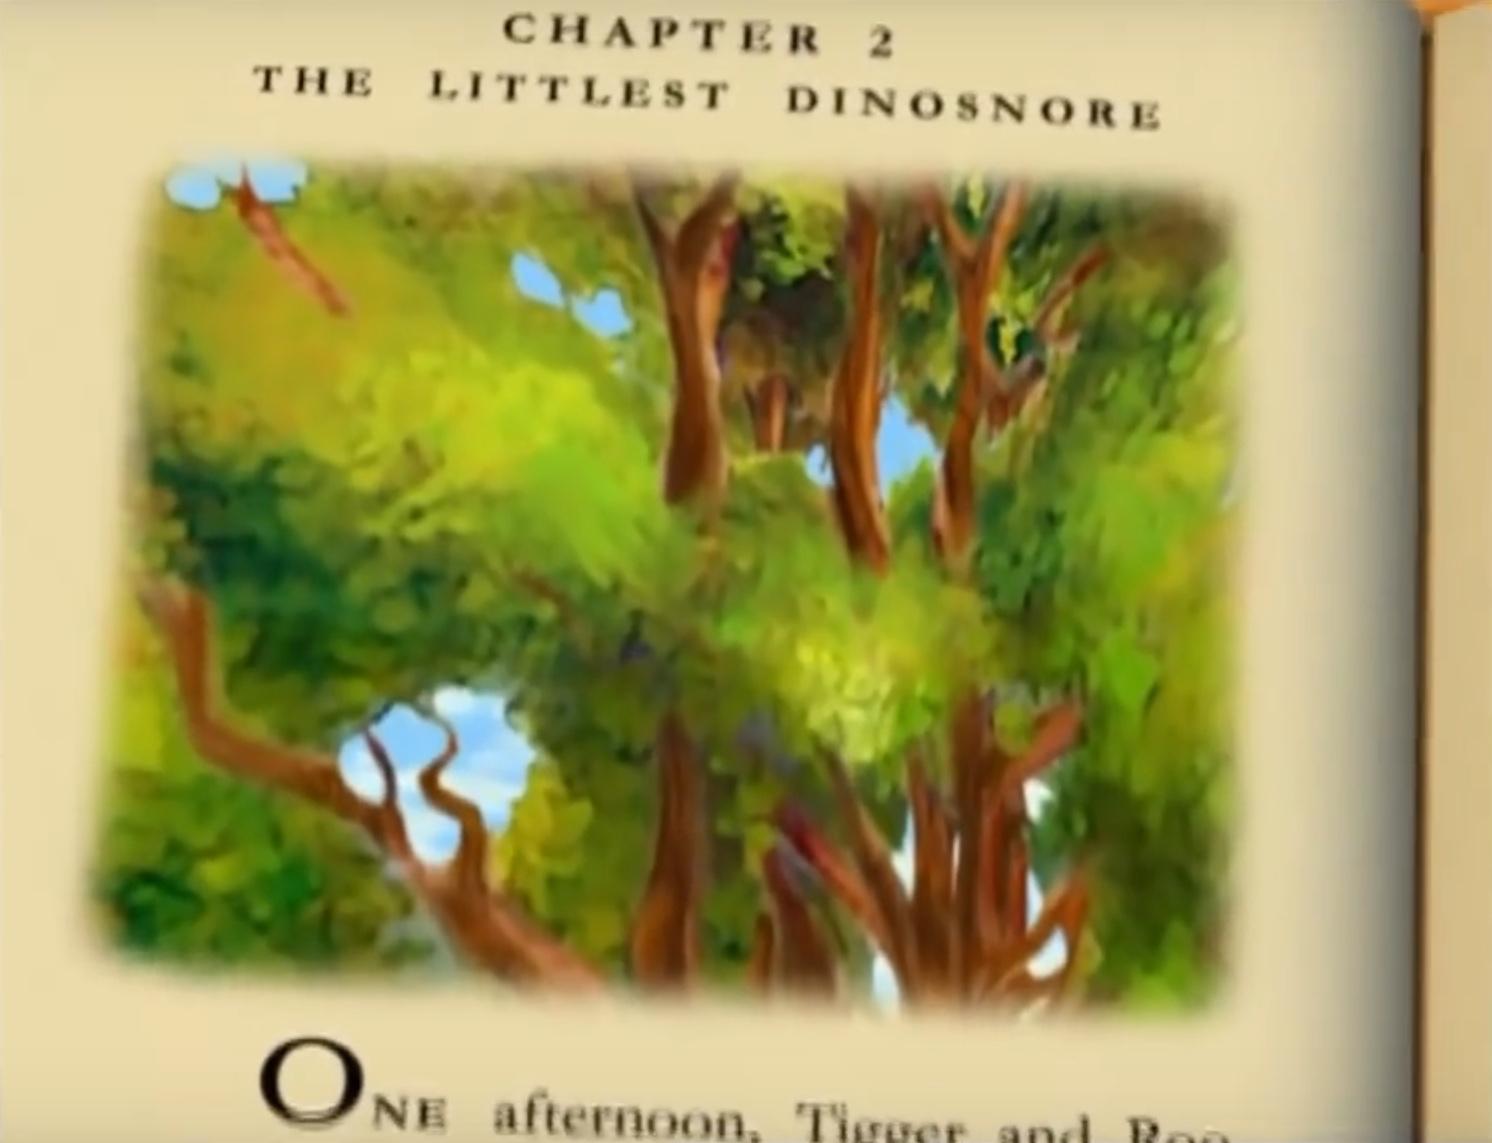 The Littlest Dinosnore